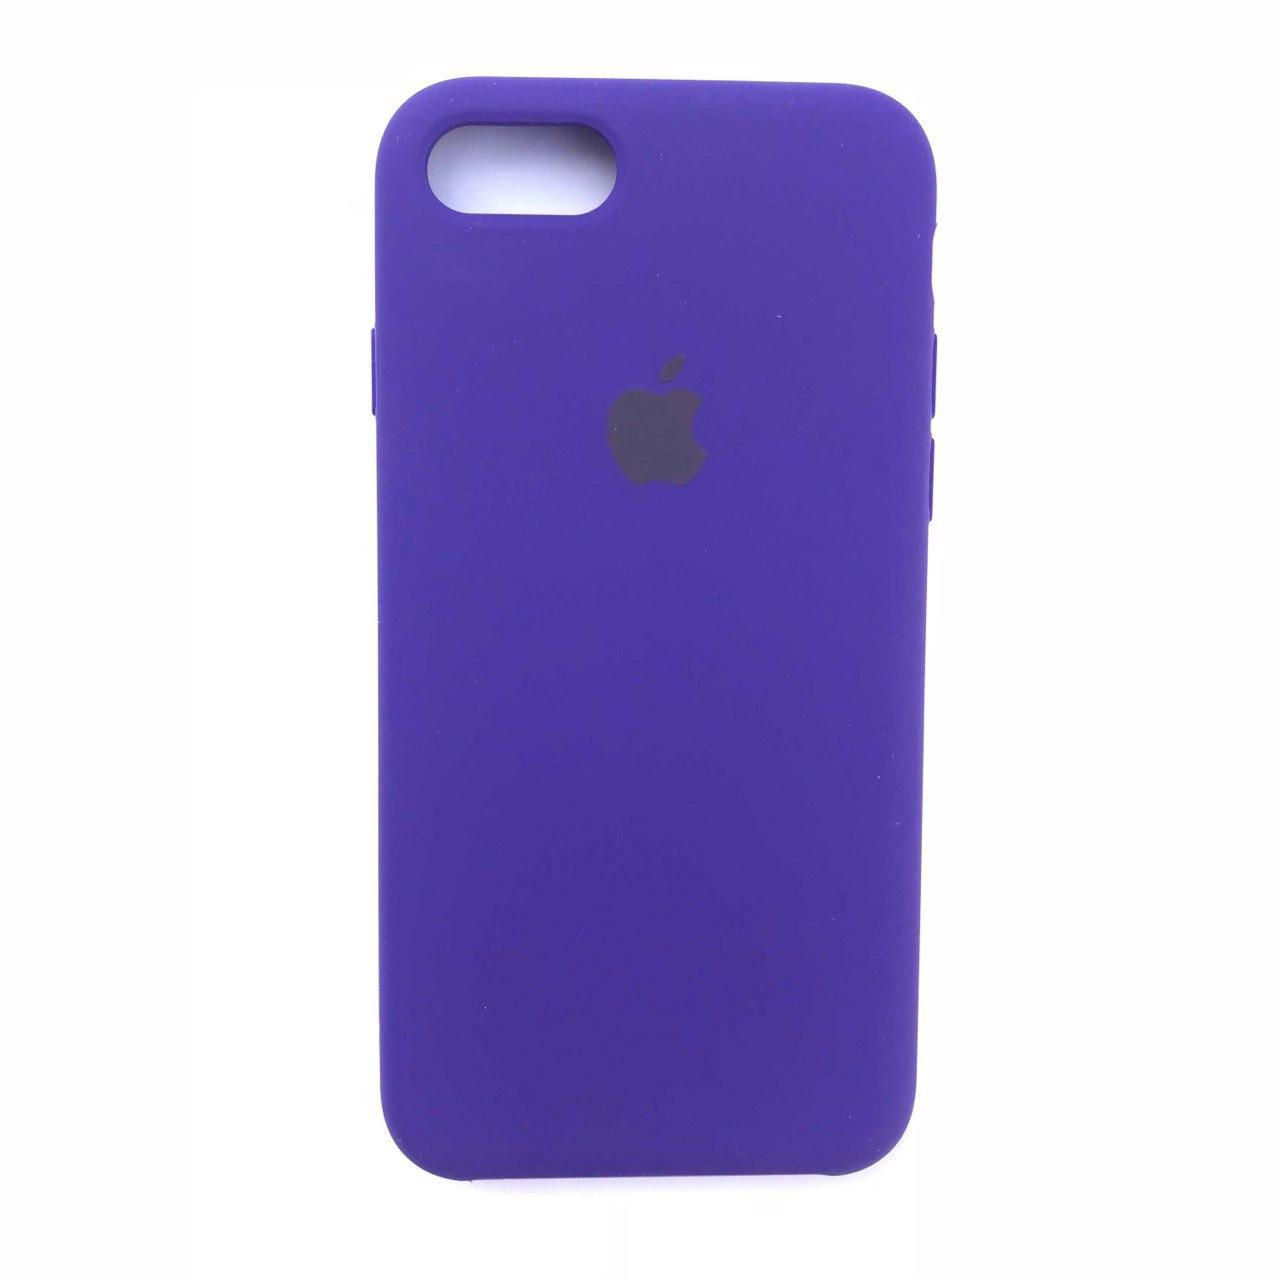 Чехол-накладка Silicone Case для Apple iPhone 7 iPhone 8 Ultra Violet